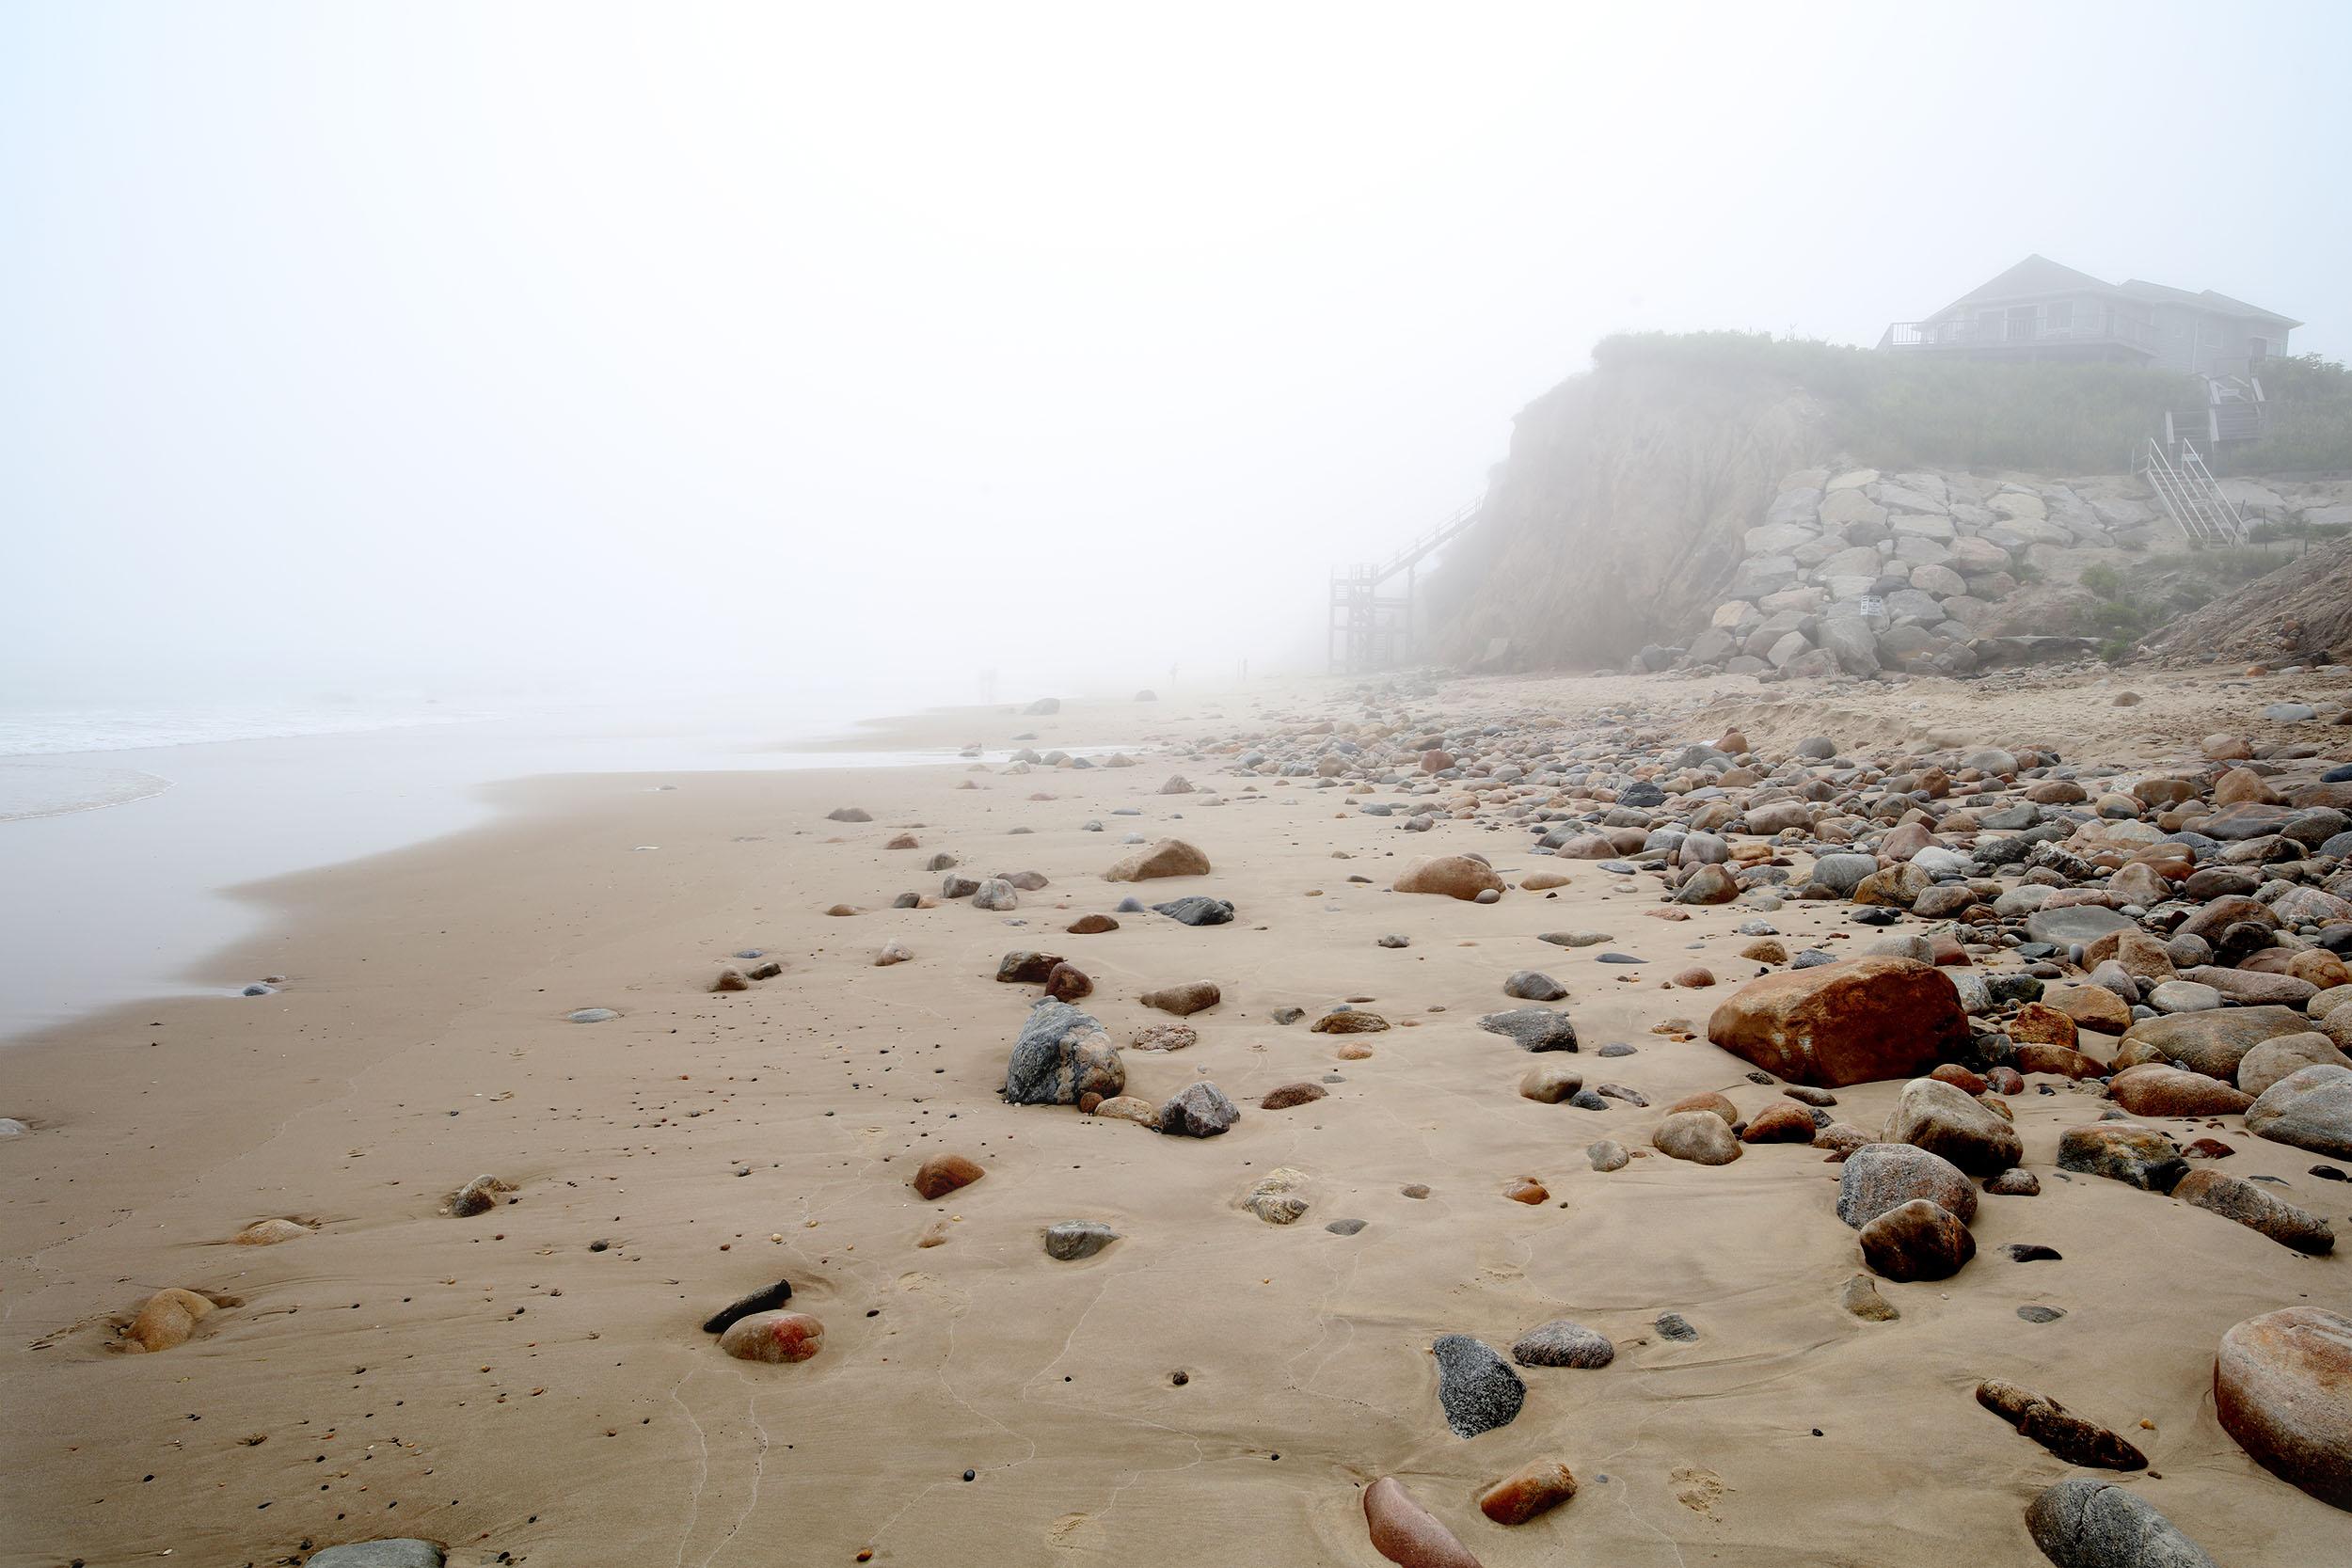 Summer_Hamptons_Beach 1_web.jpg